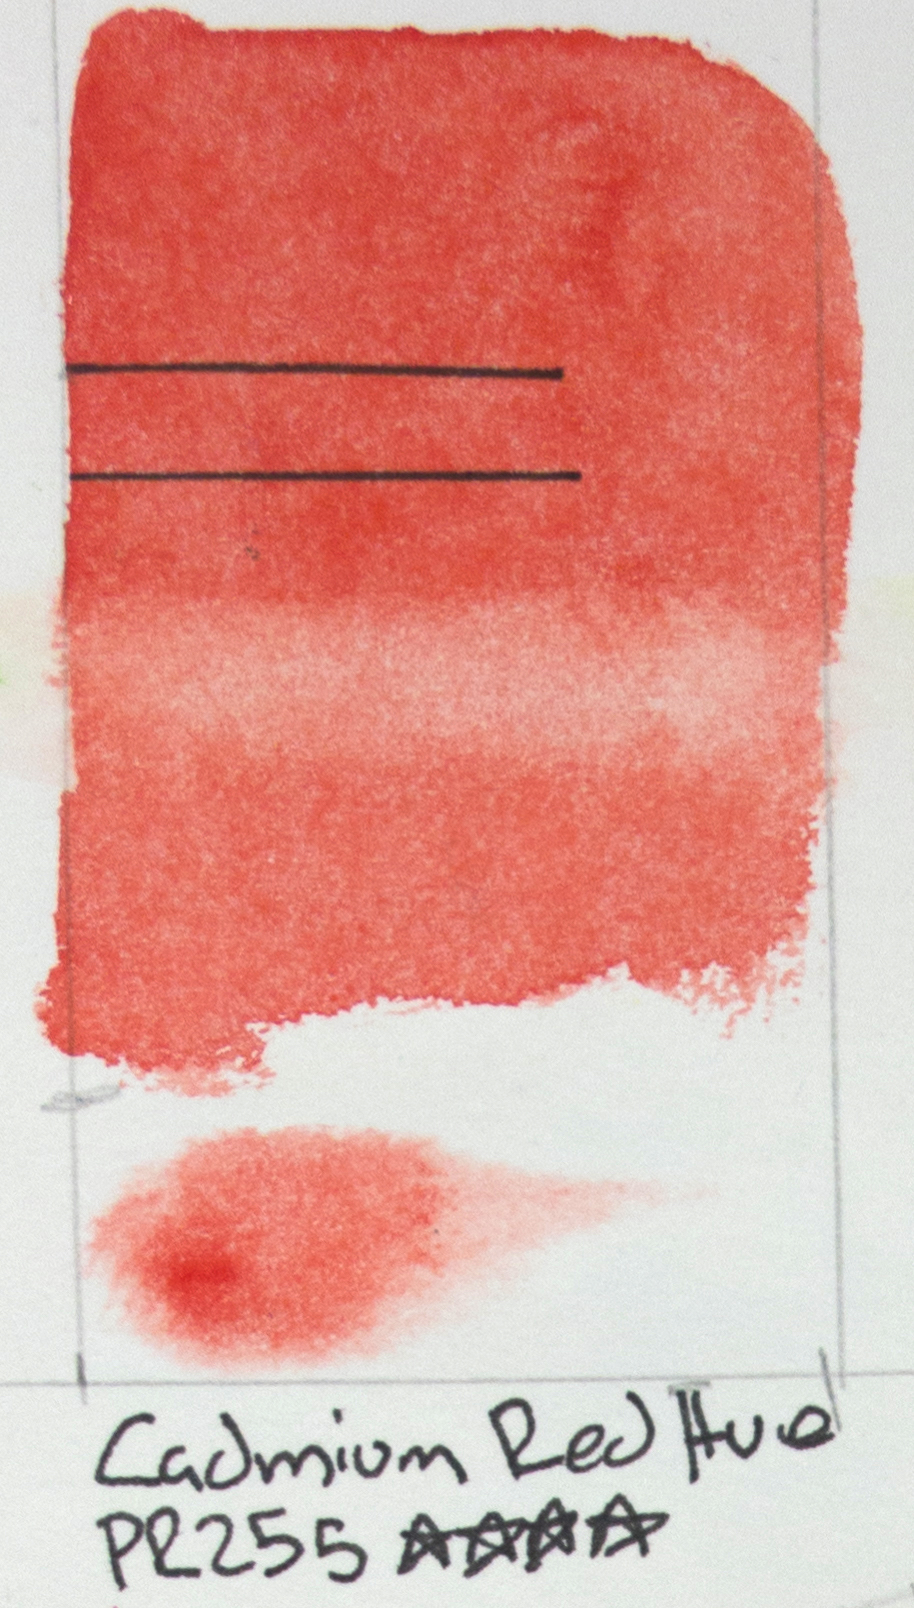 Schmincke Akademie - Cadmium Red Hue PR255